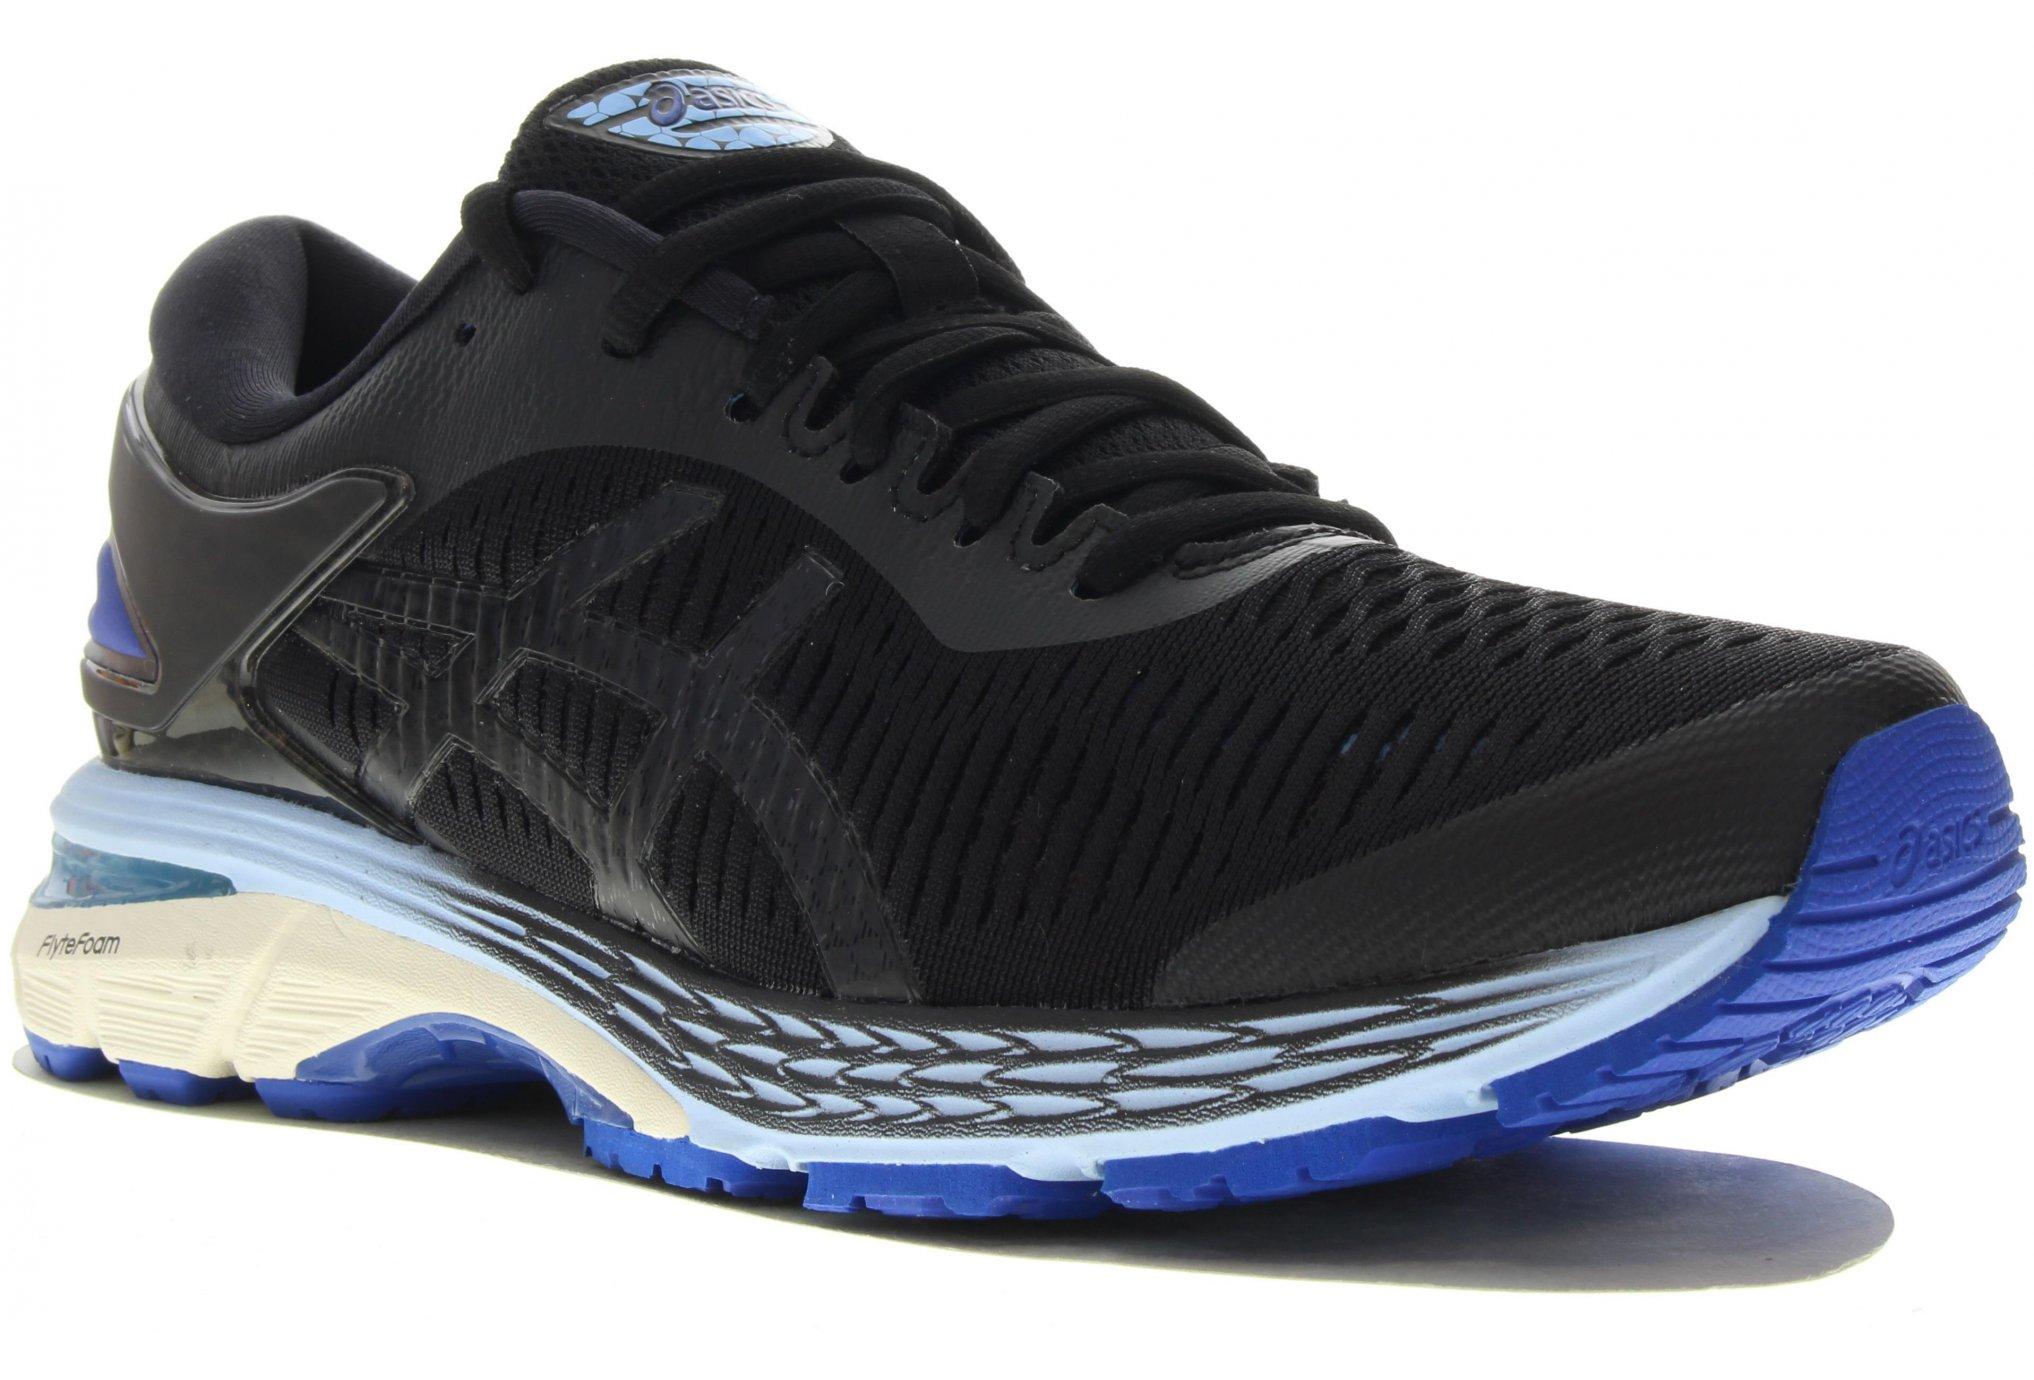 Asics Gel Kayano 25 W Chaussures running femme